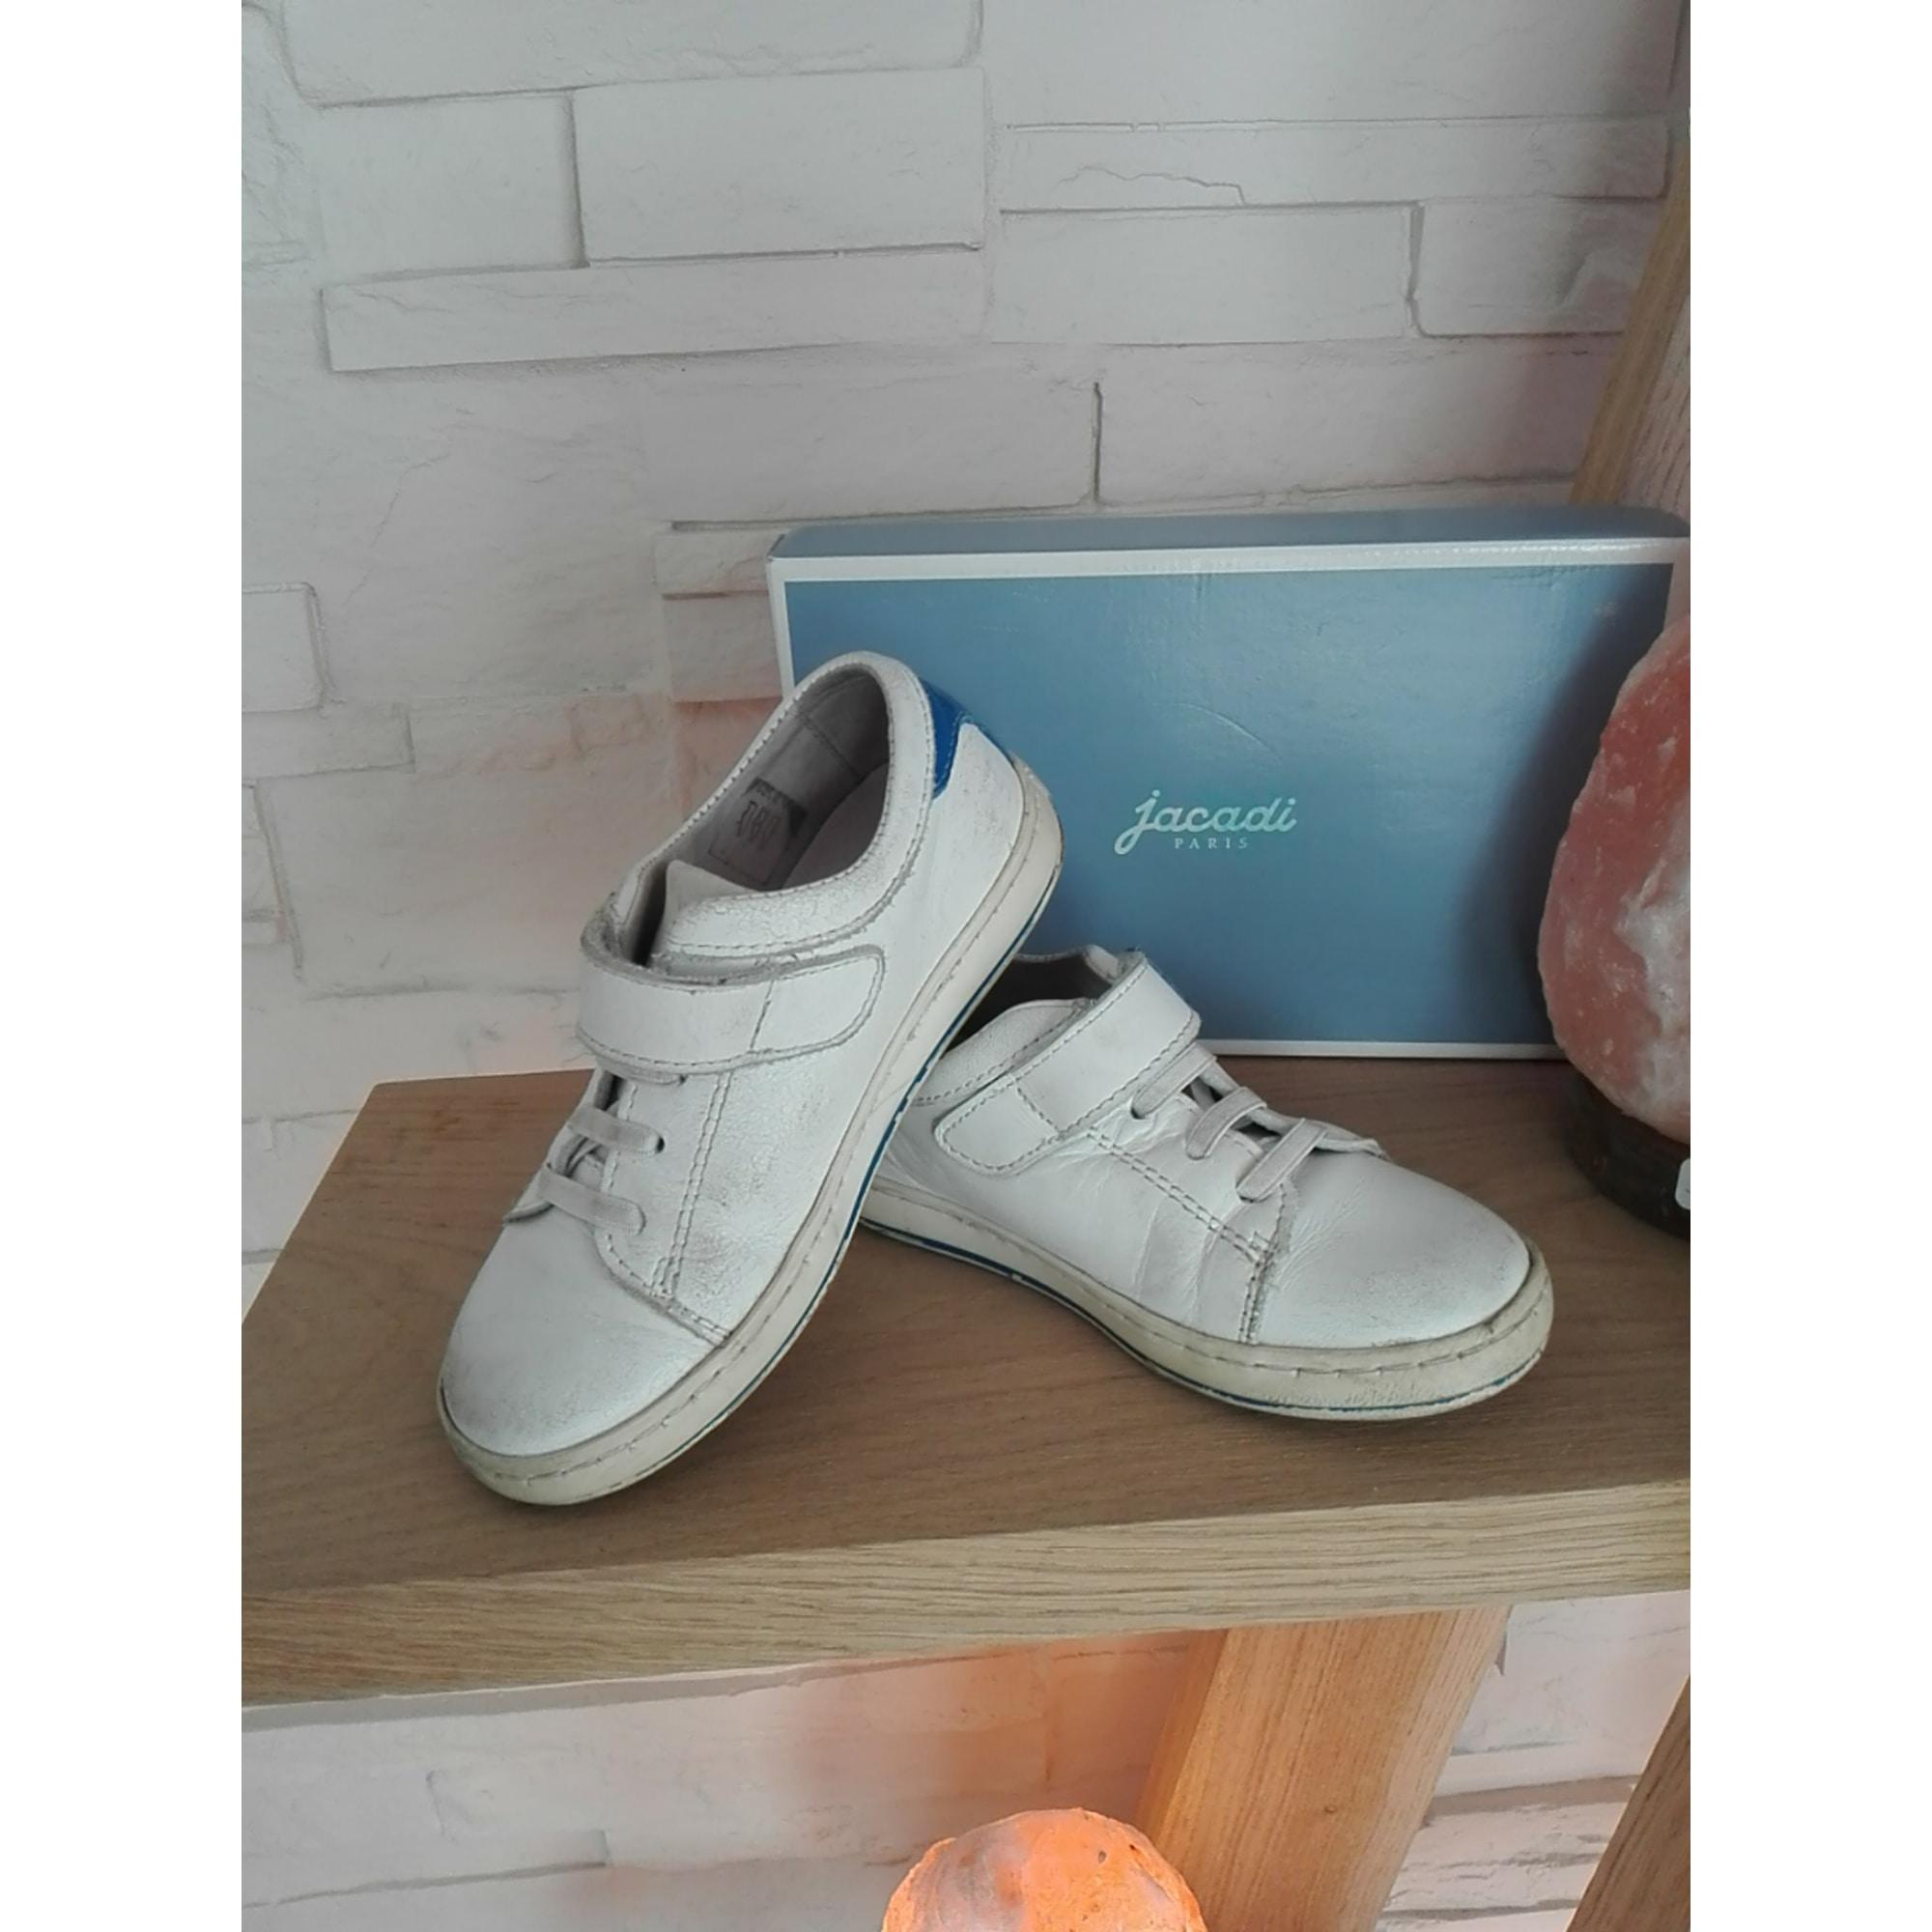 Chaussures à scratch JACADI Blanc, blanc cassé, écru